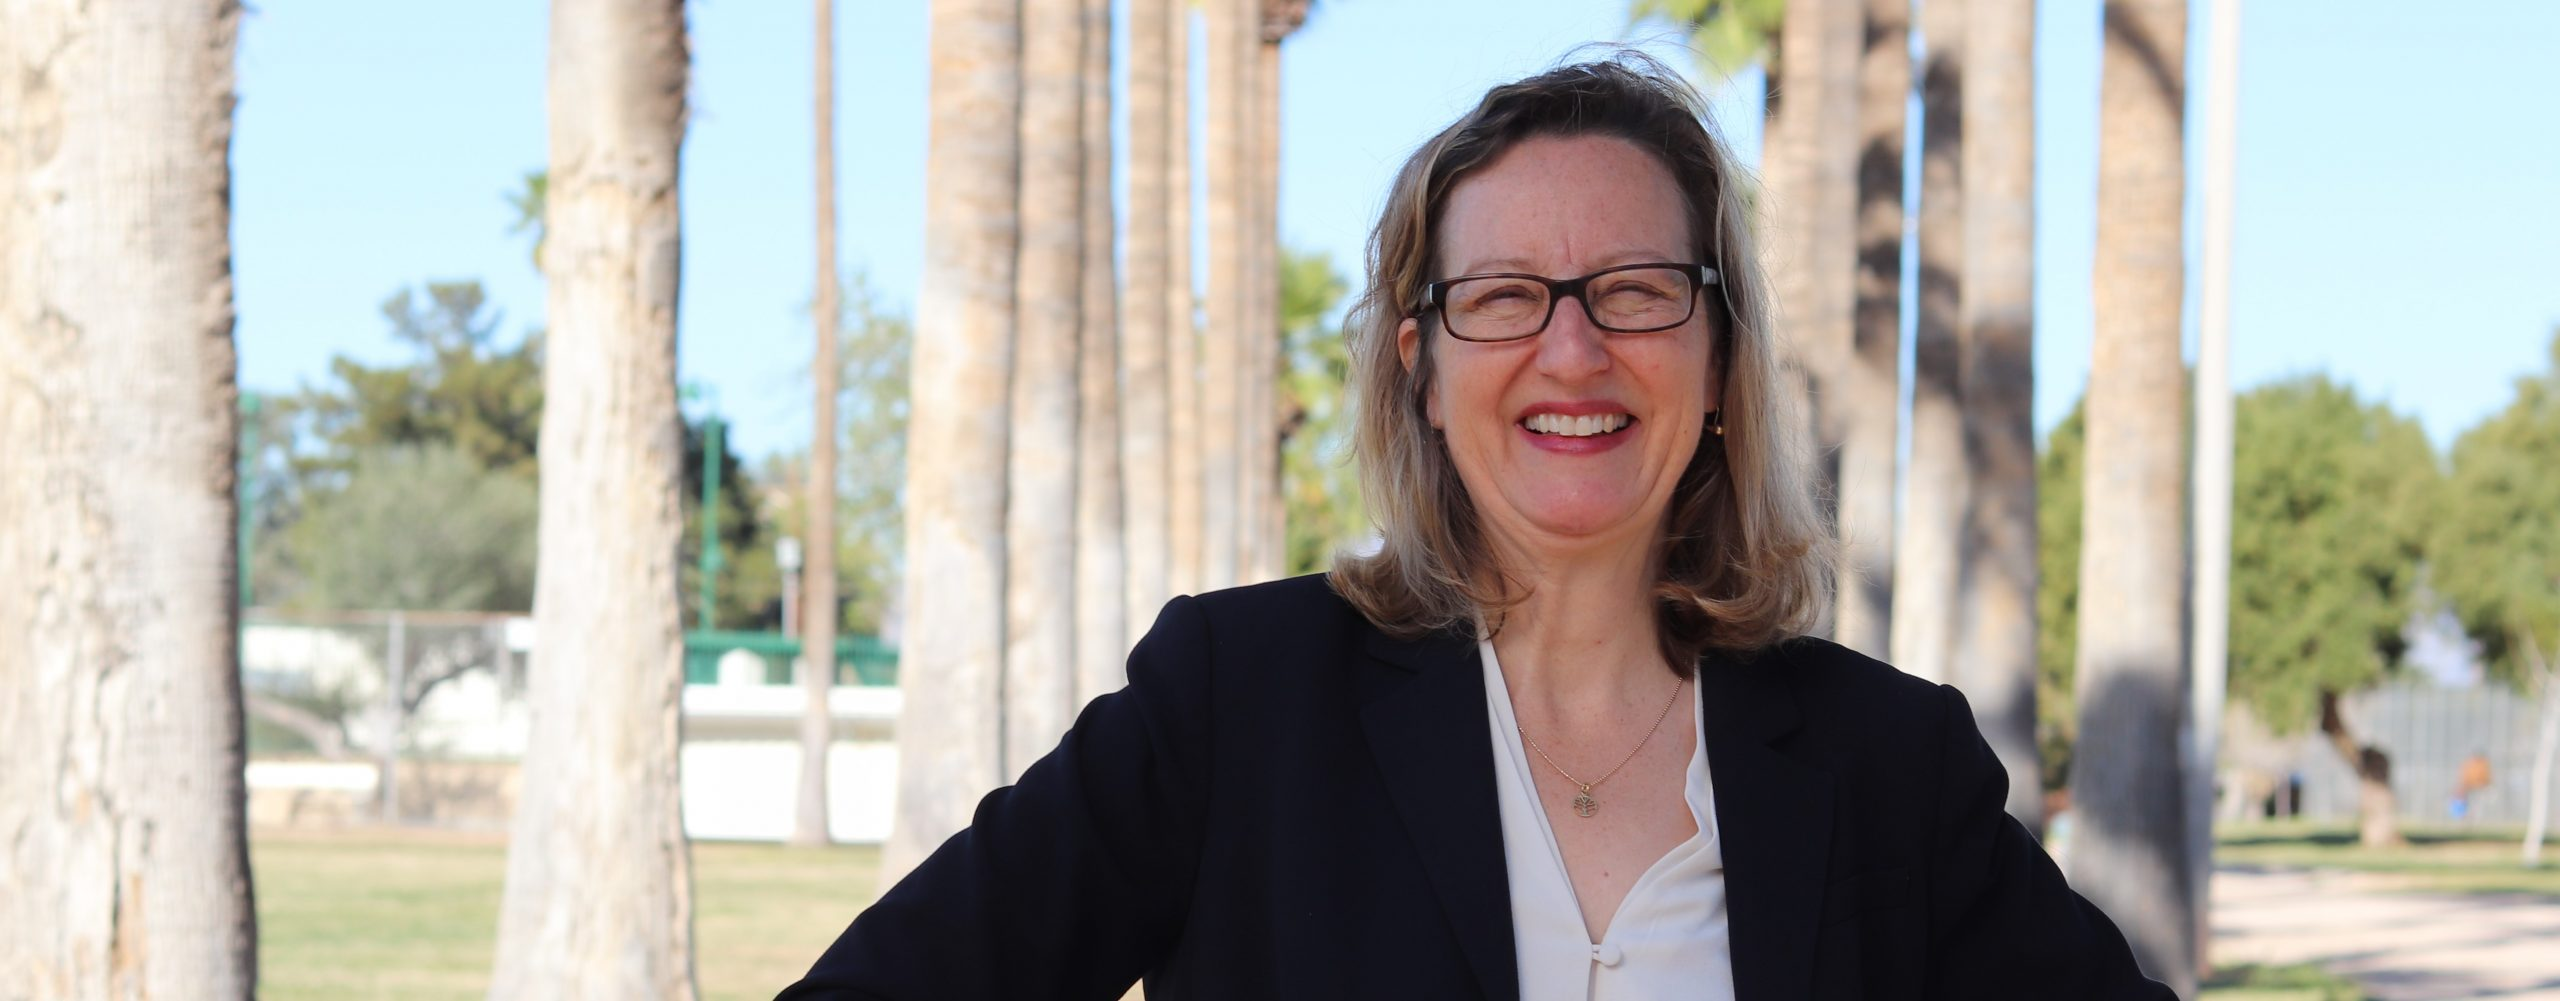 SEE: Kirsten Engel for AZ Senate, speaking at DGT on October 5, 2020